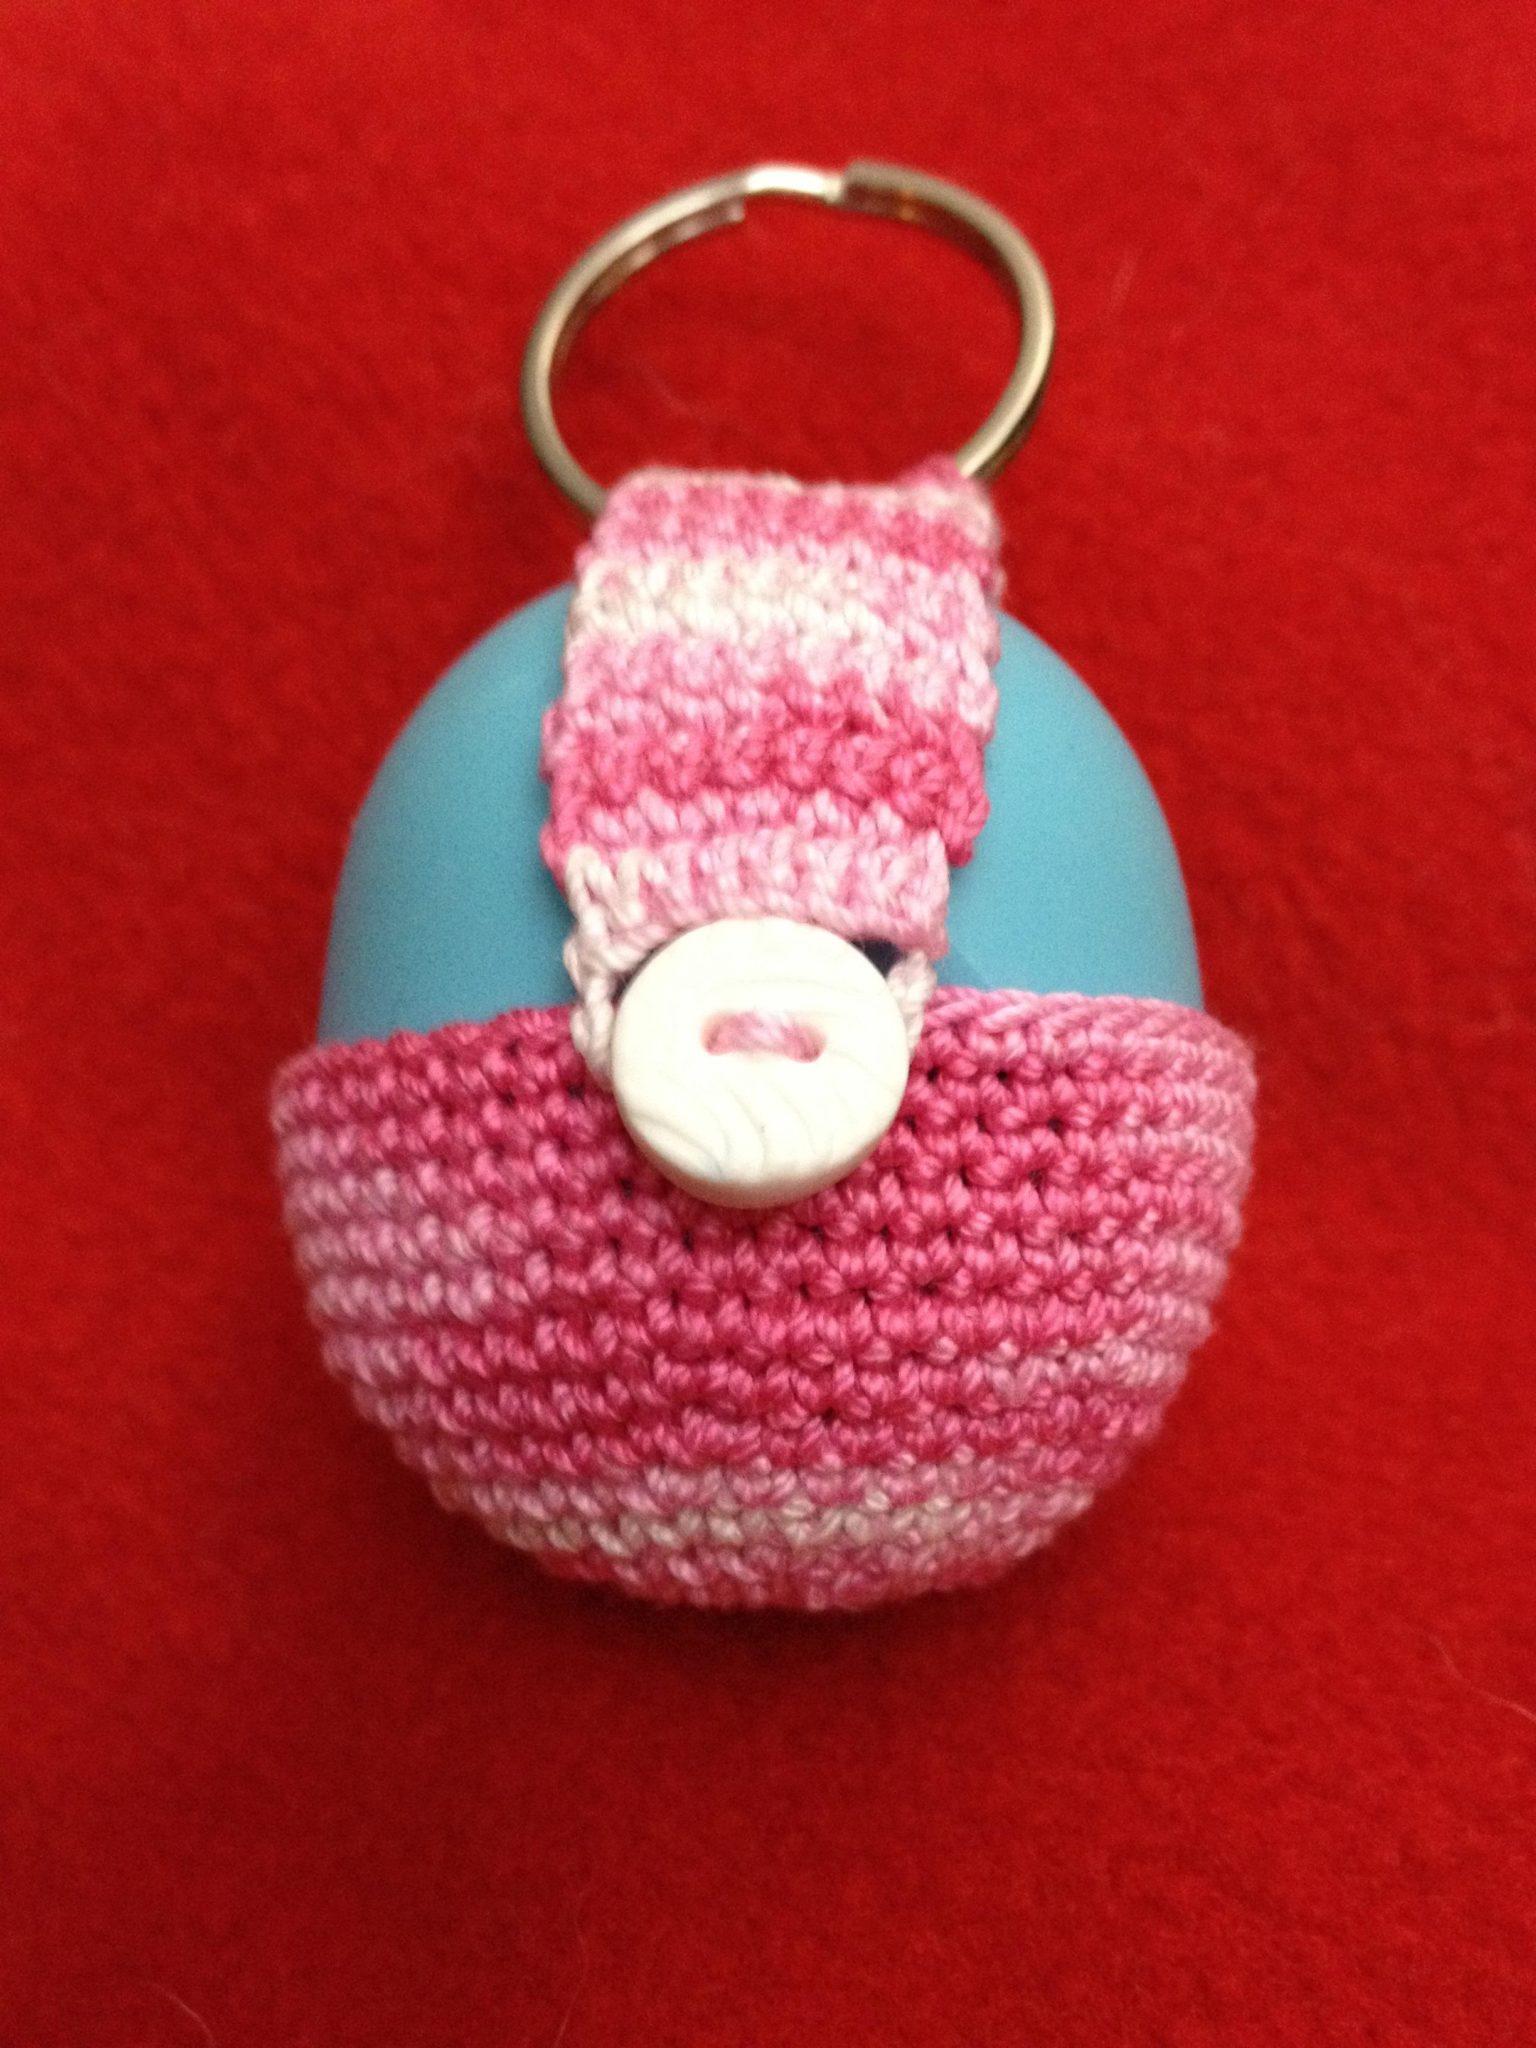 Crochet Lip Balm Cozy